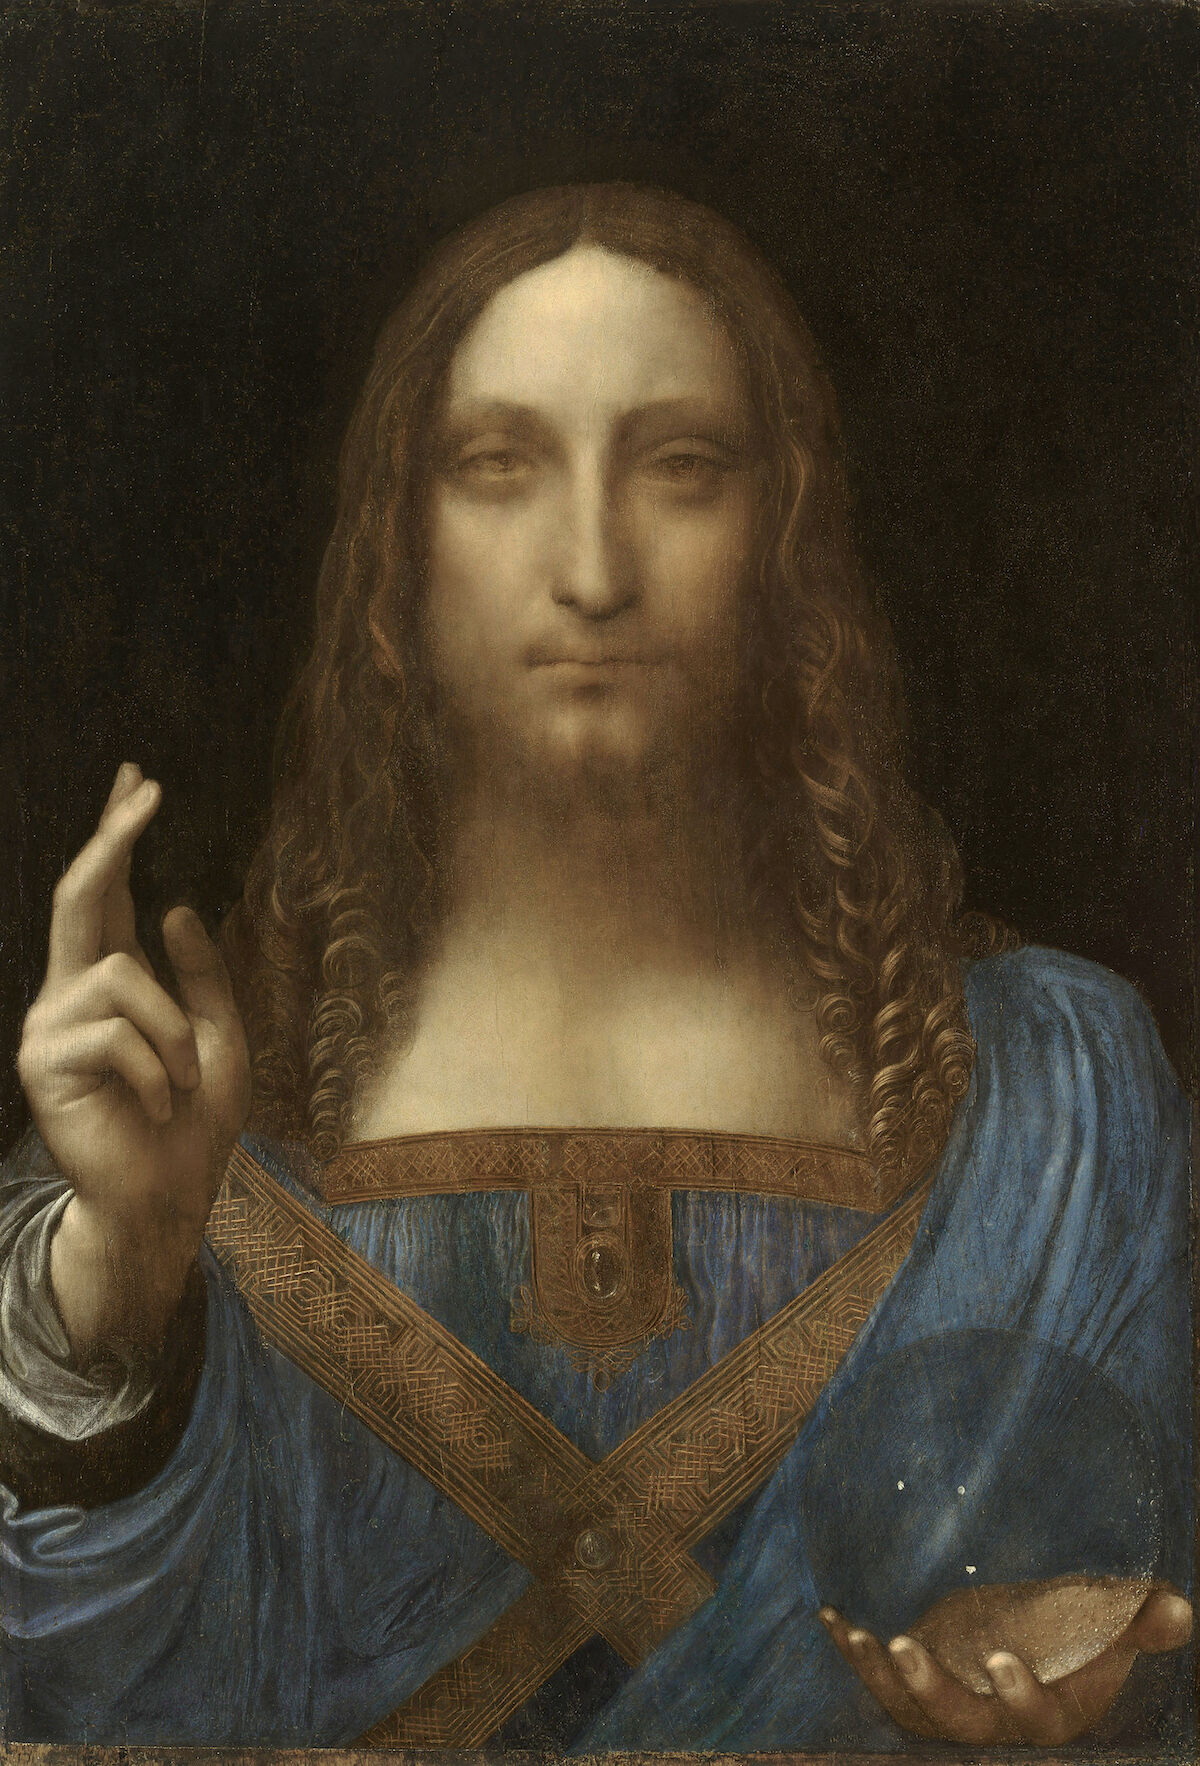 Painting attributed to Leonardo da Vinci, Salvator Mundi, circa 1500. Courtesy Abu Dhabi Tourism & Culture Authority, via Wikimedia Commons.